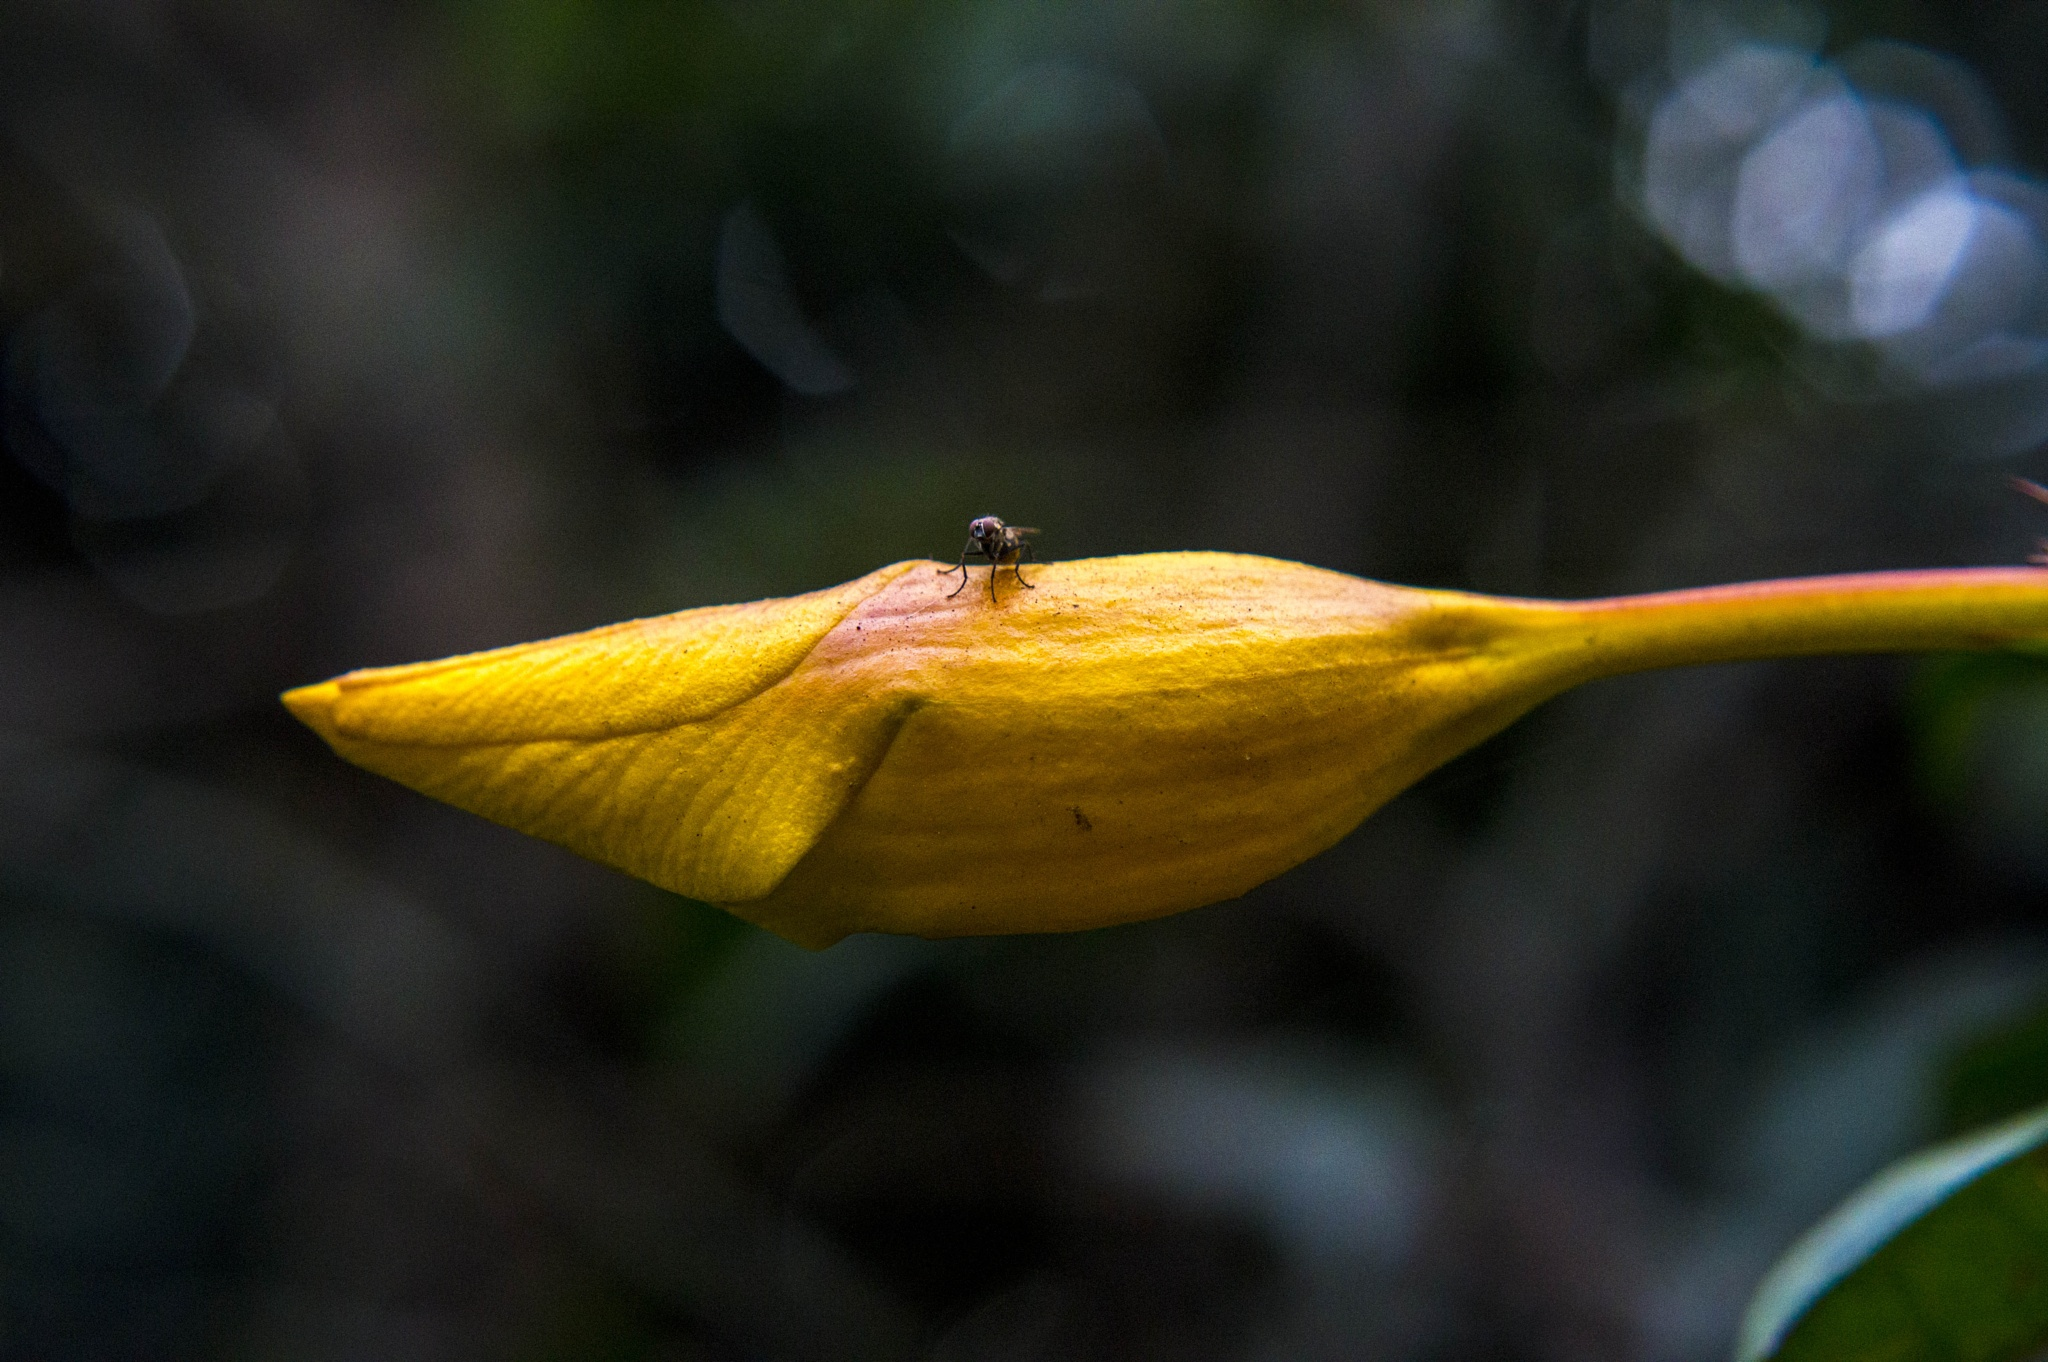 the fly by BearMan